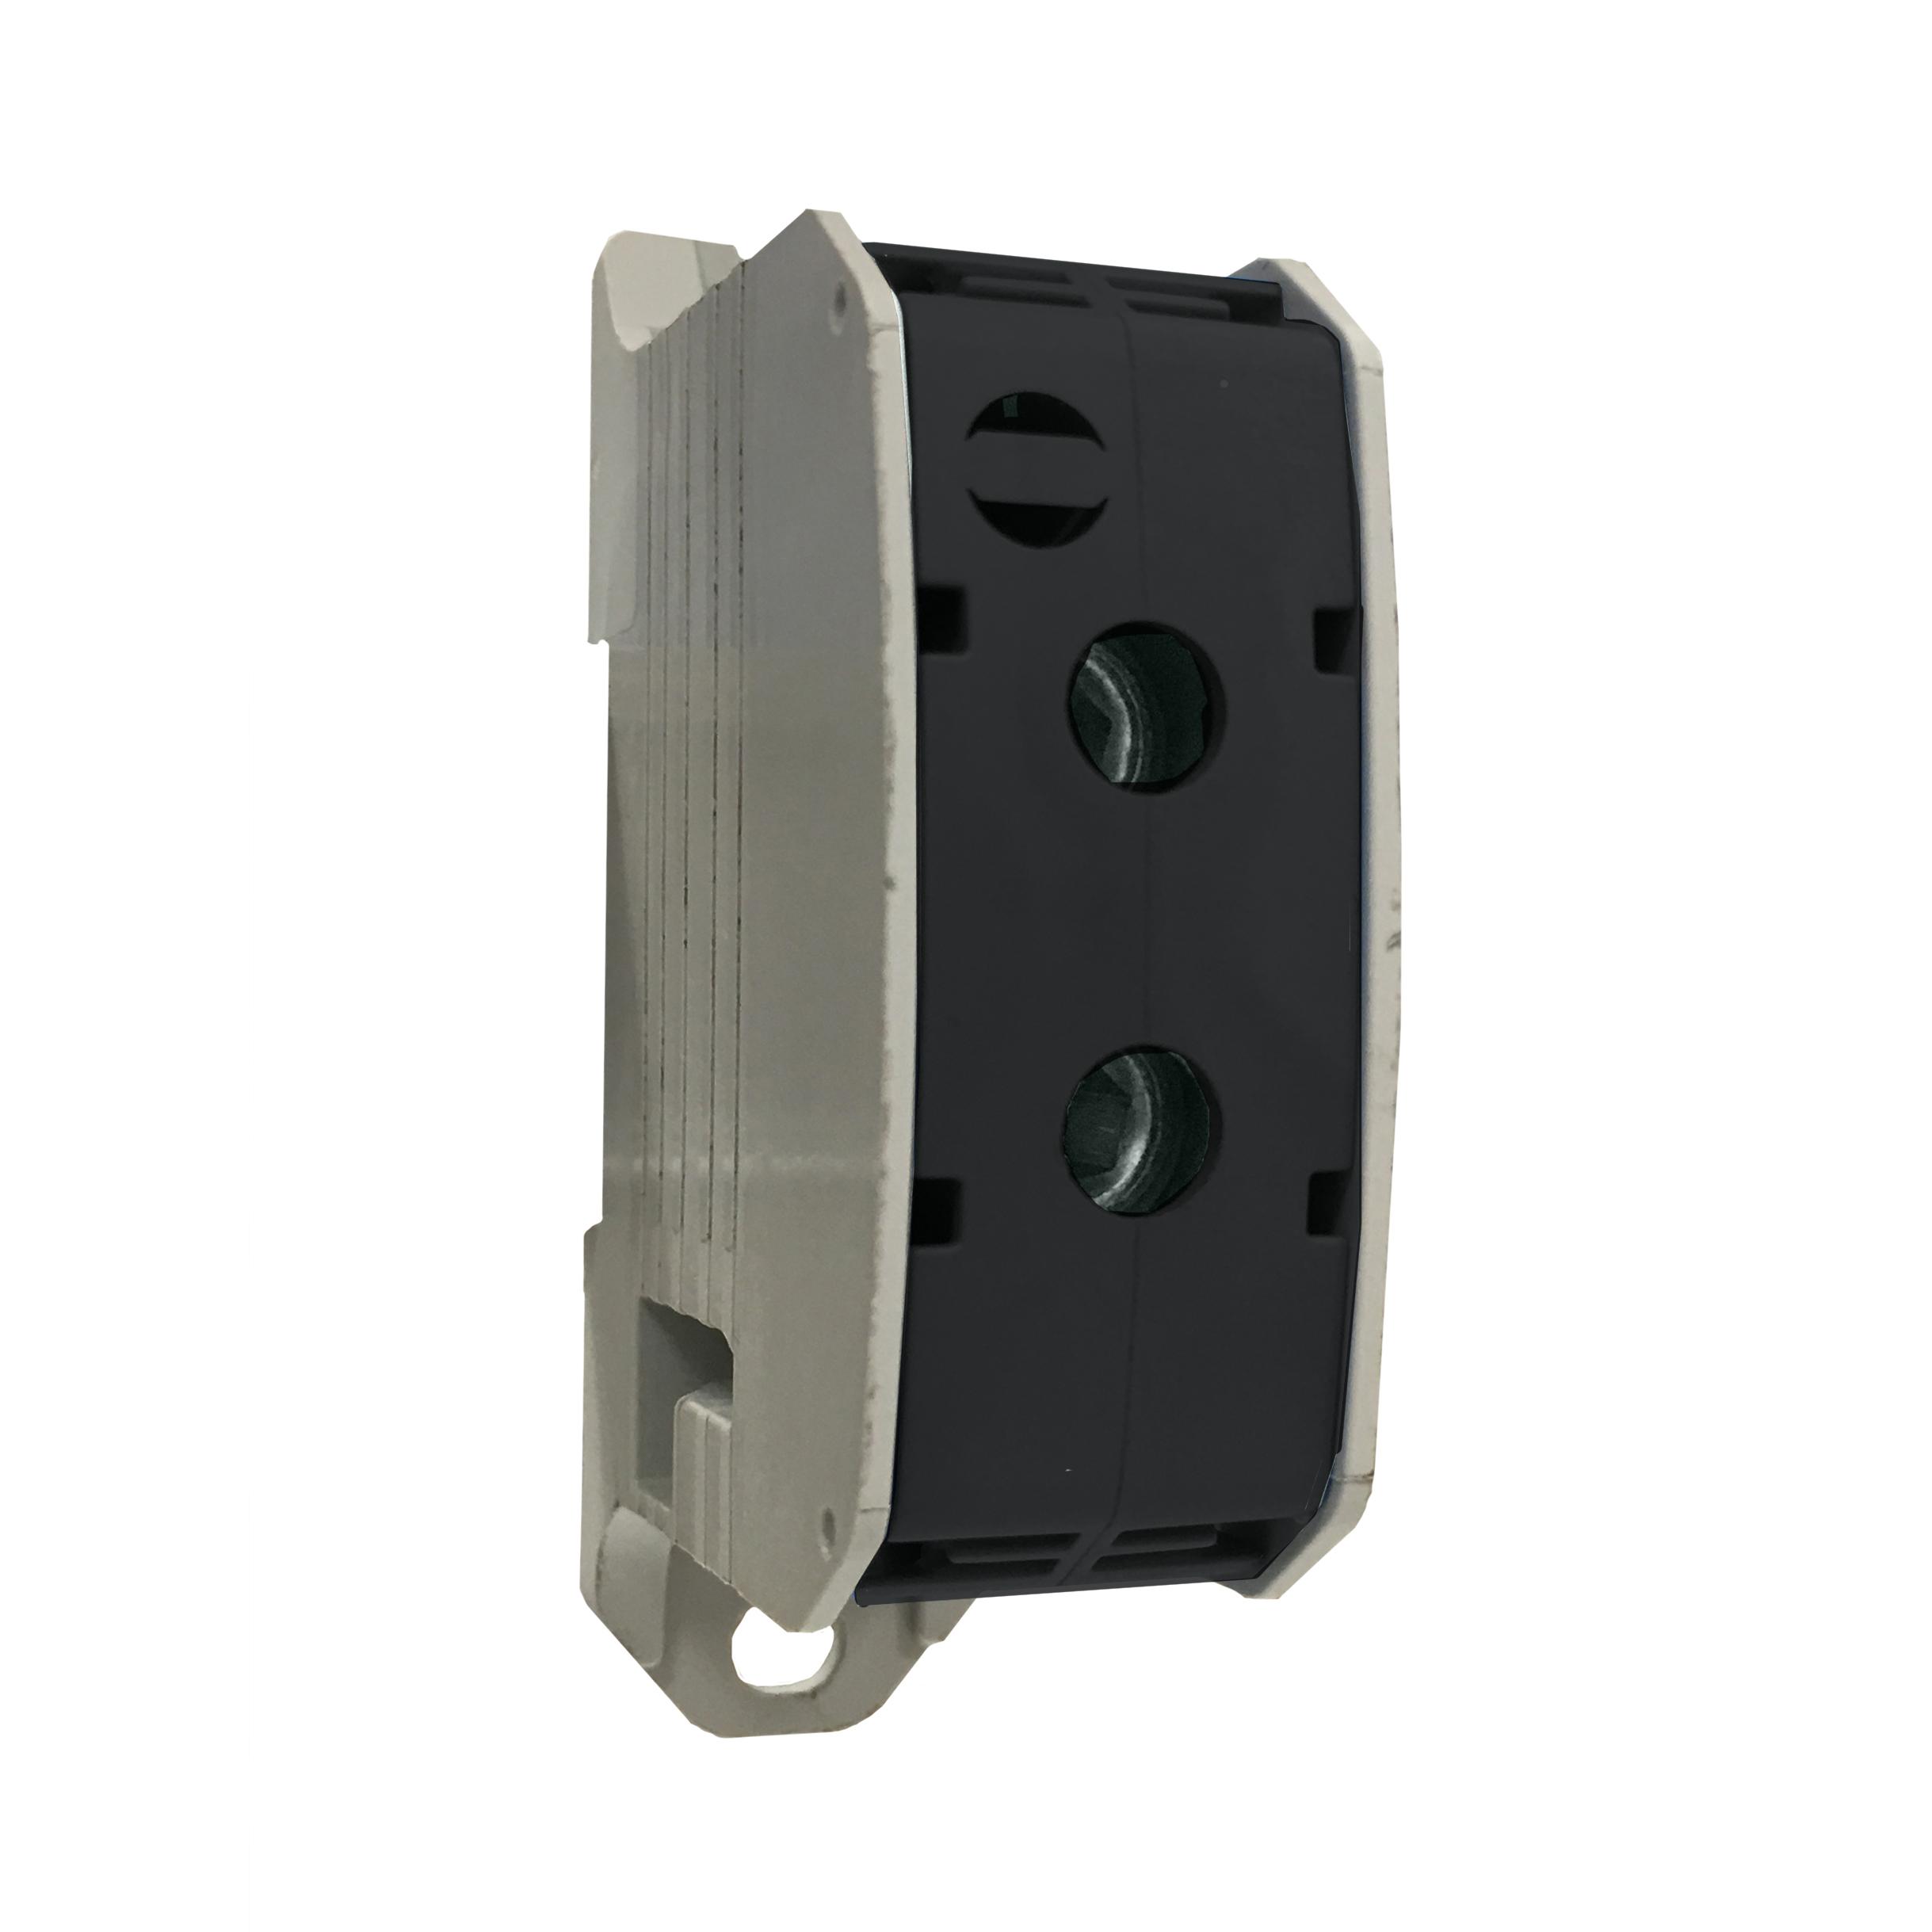 1 Stk Aluminium /Kupfer Klemme, 1-polig, 300mm² schwarz IKA21750--